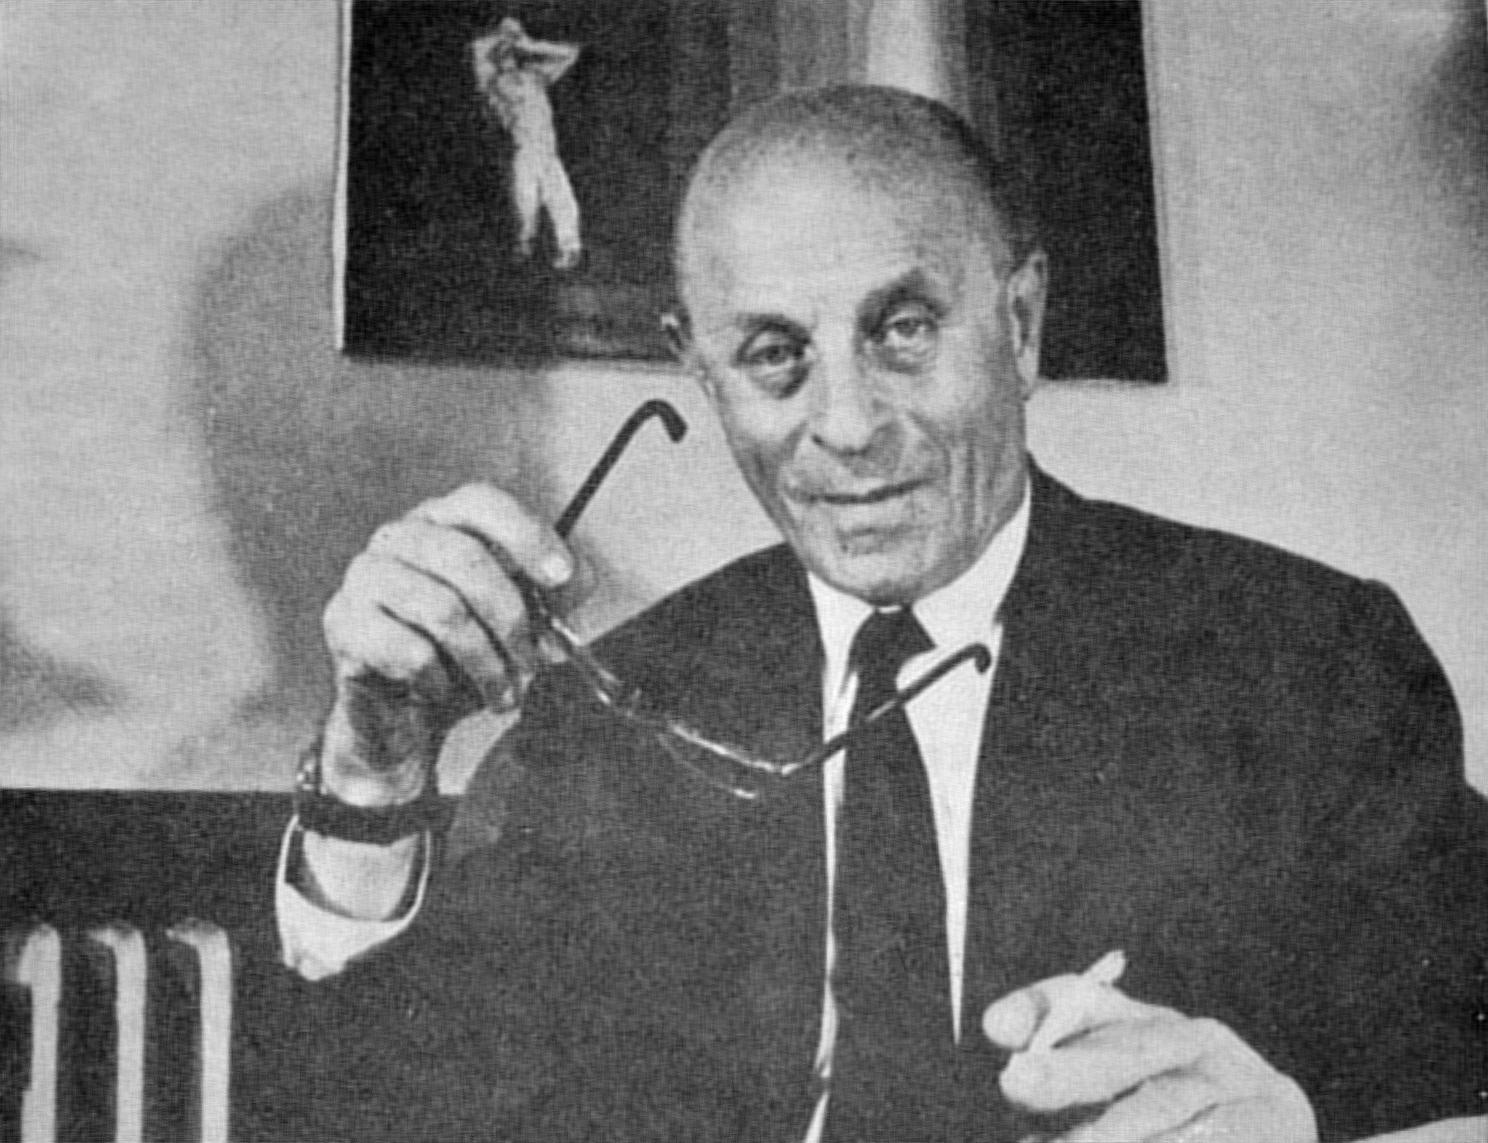 Ladislao José Biro, ladislao biro, Ladislao José Biro google doodle